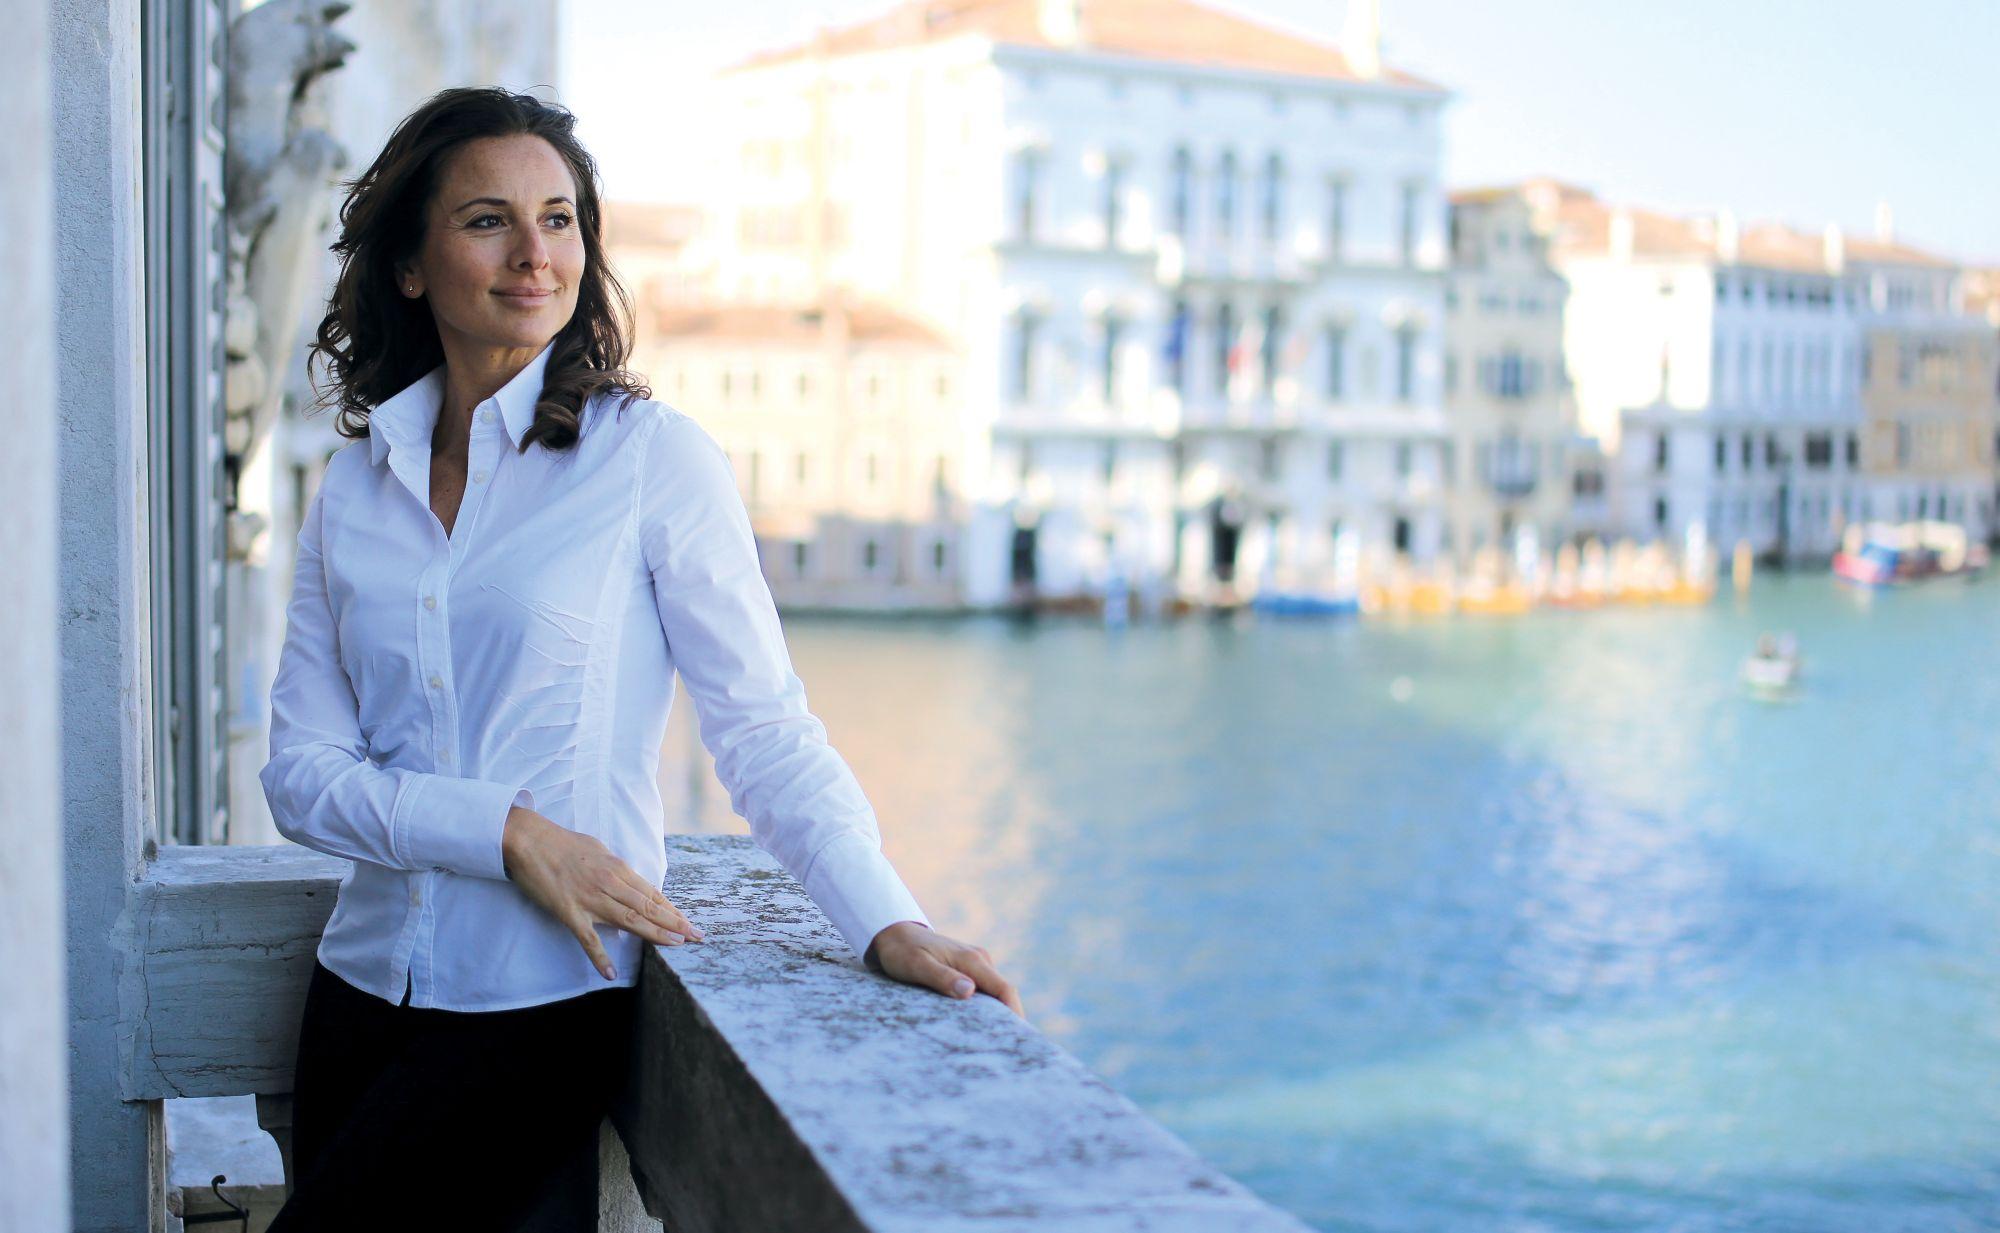 #TatlerTips: The Globetrotter's 10 in Venice